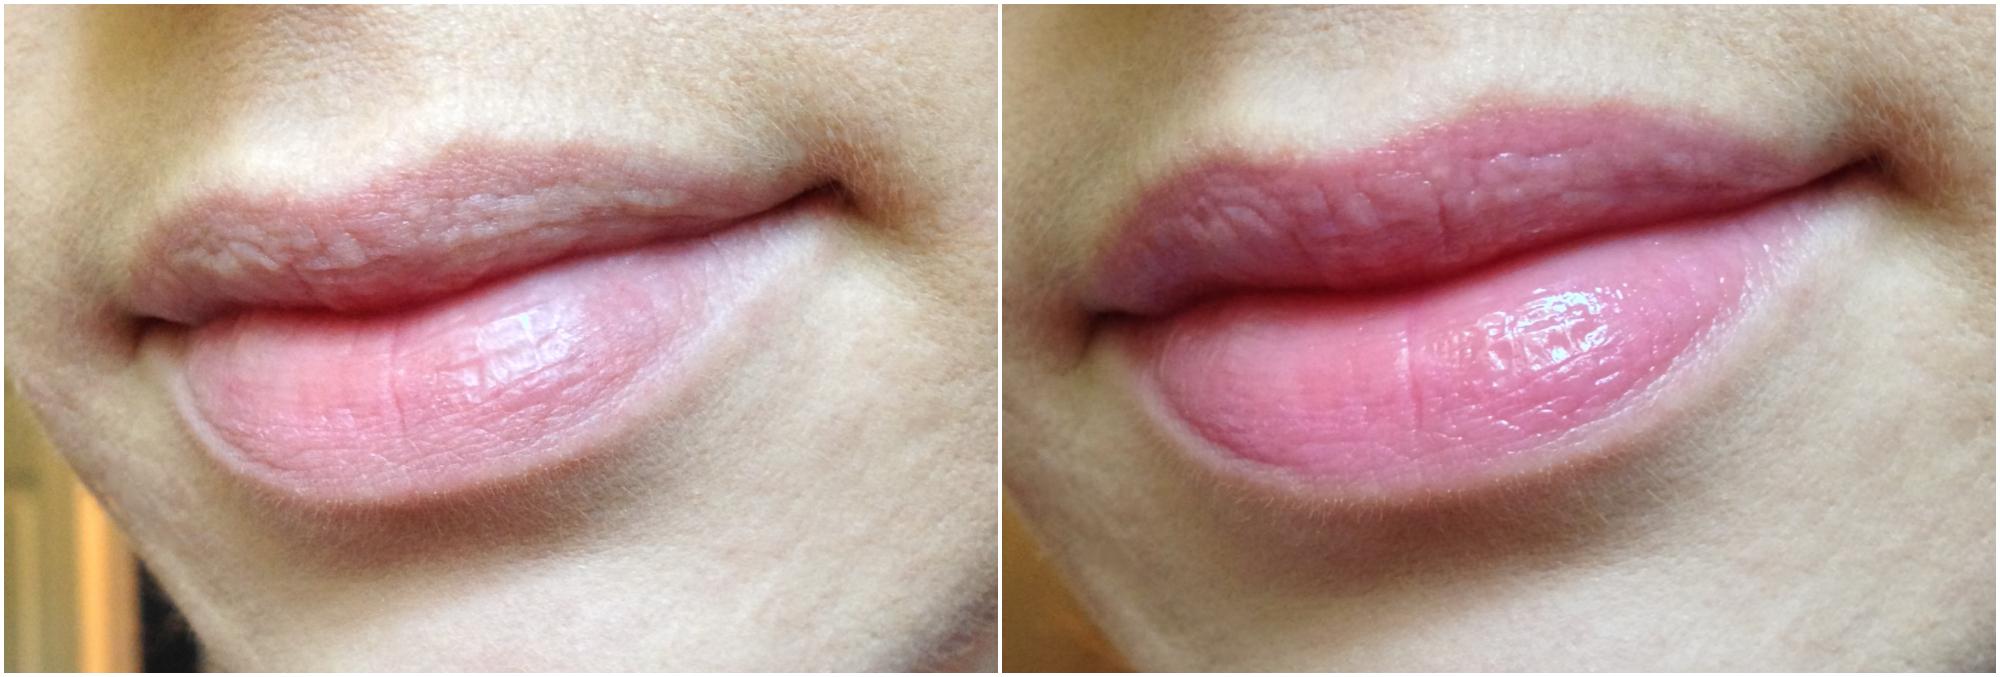 Unique Lip Balm Balm in Unique Pink